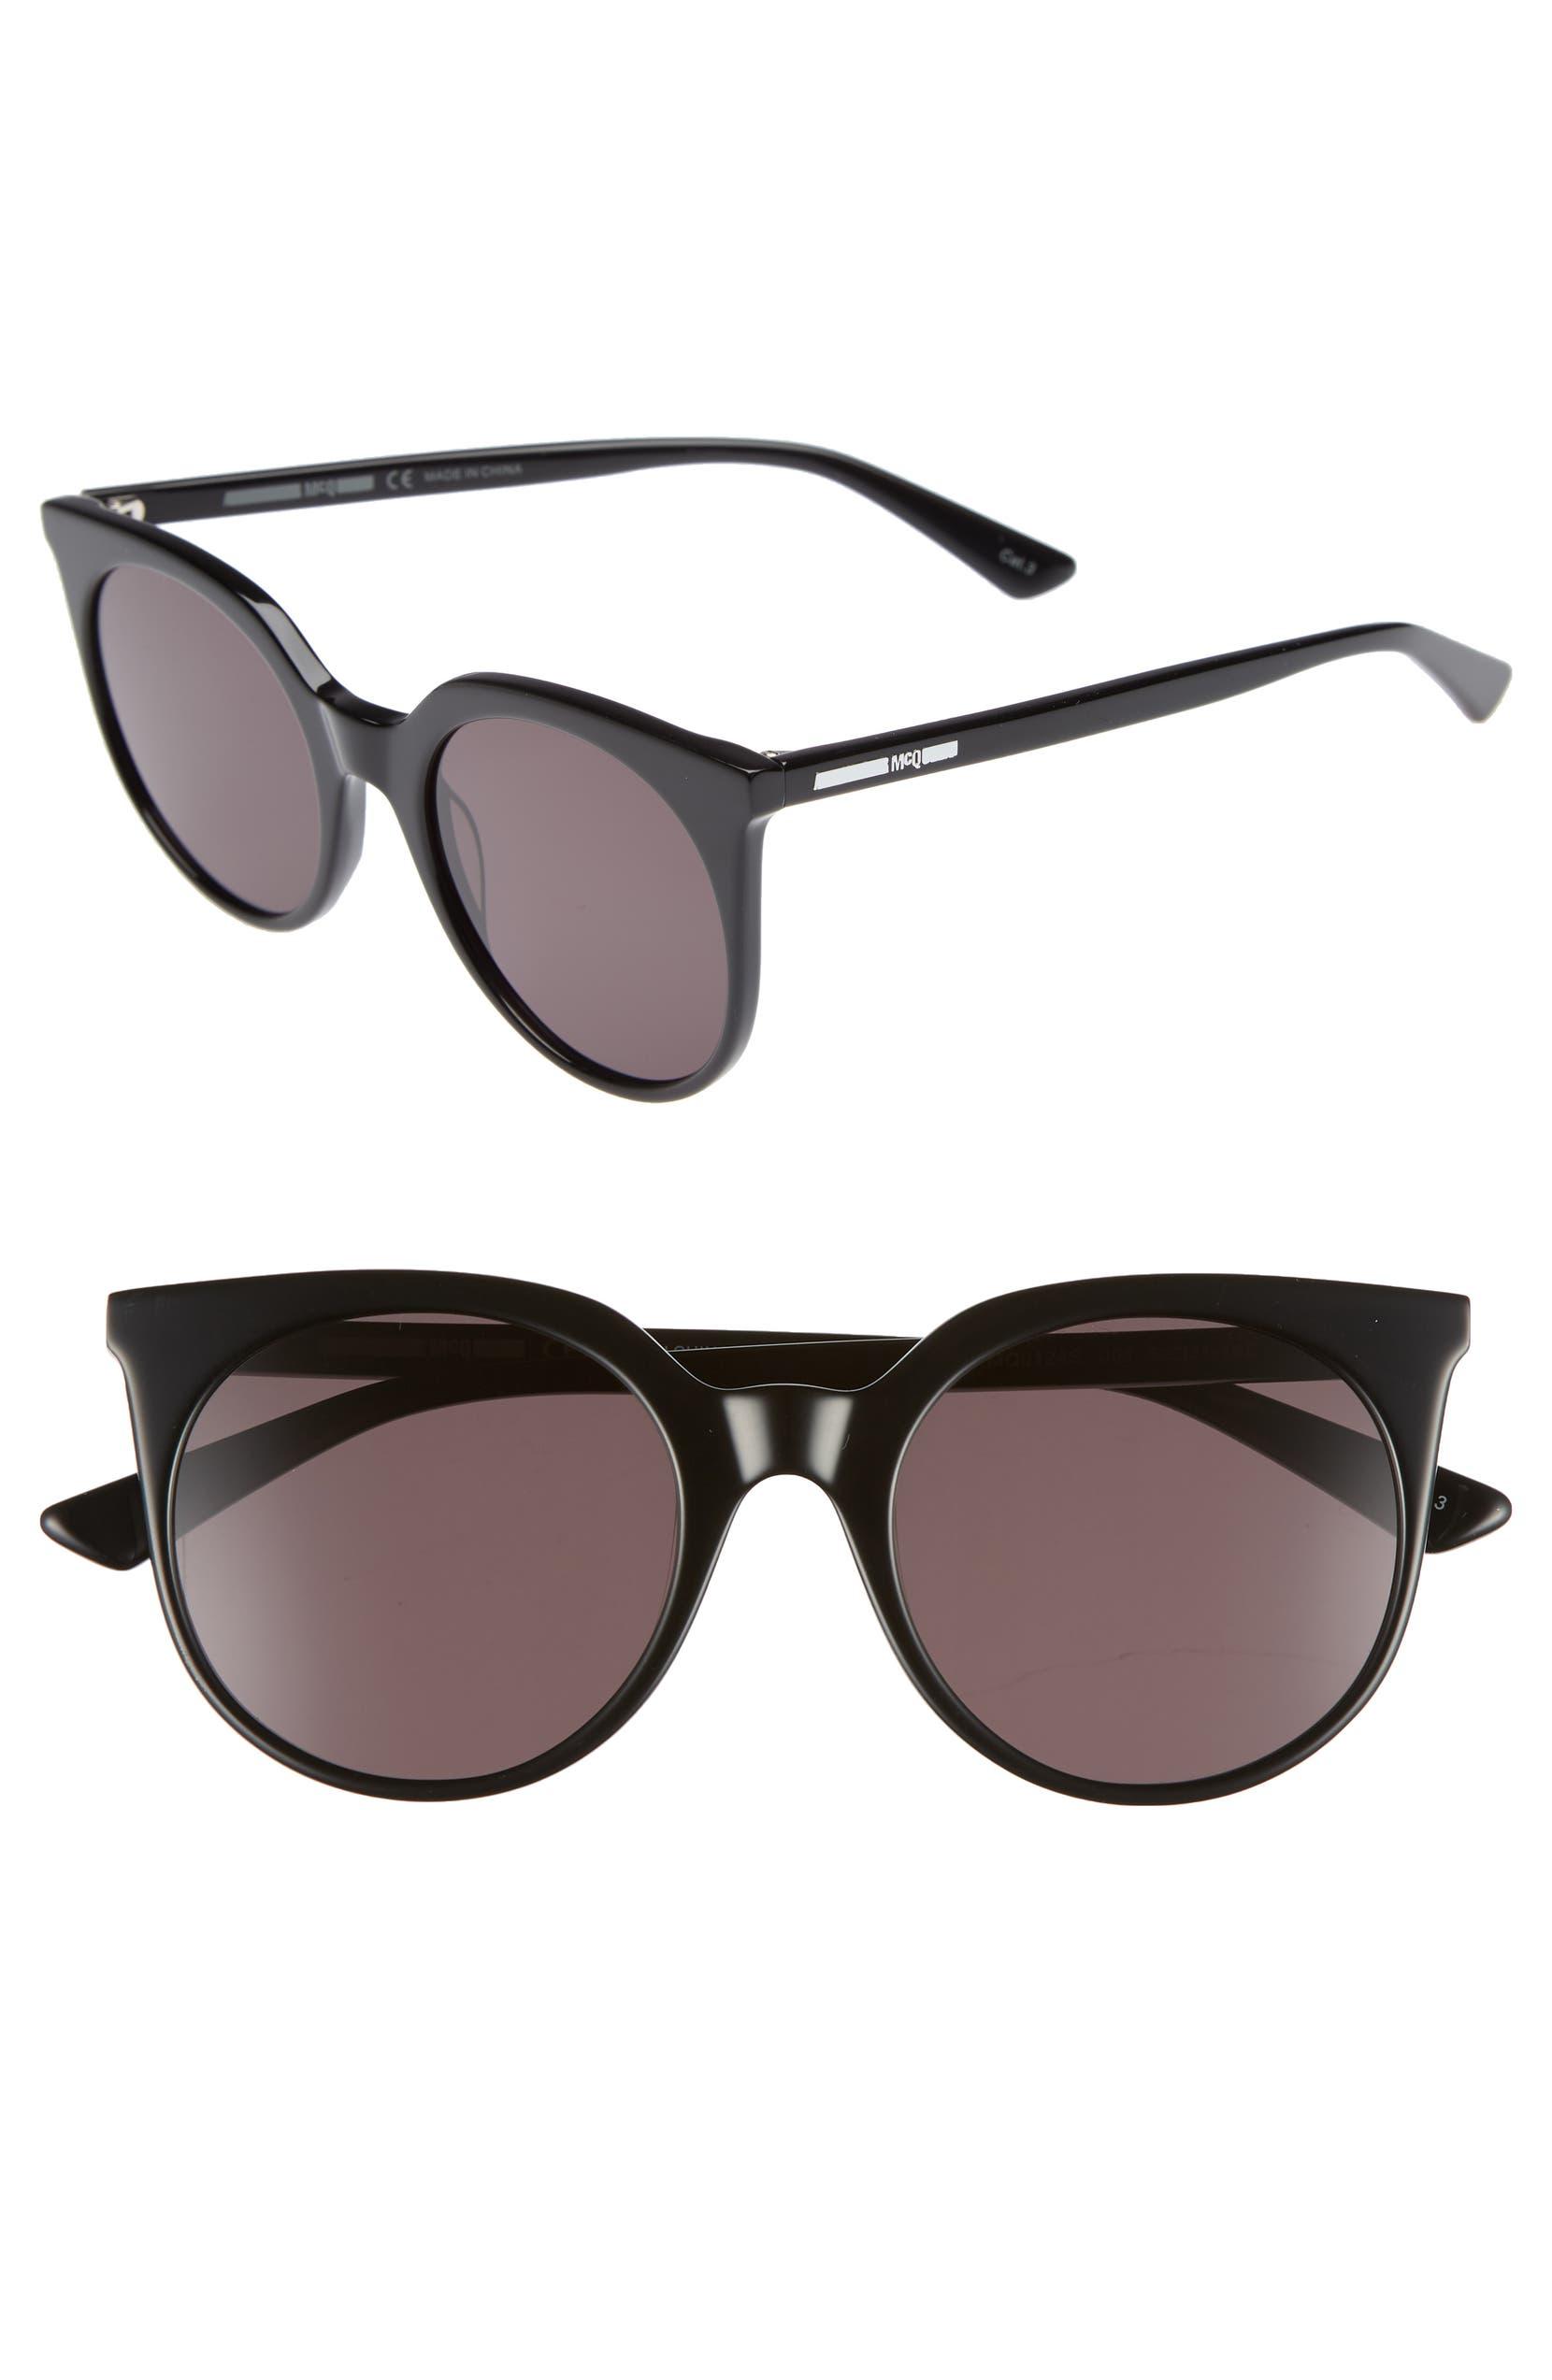 8d07072fad McQ Alexander McQueen 52mm Cat Eye Sunglasses